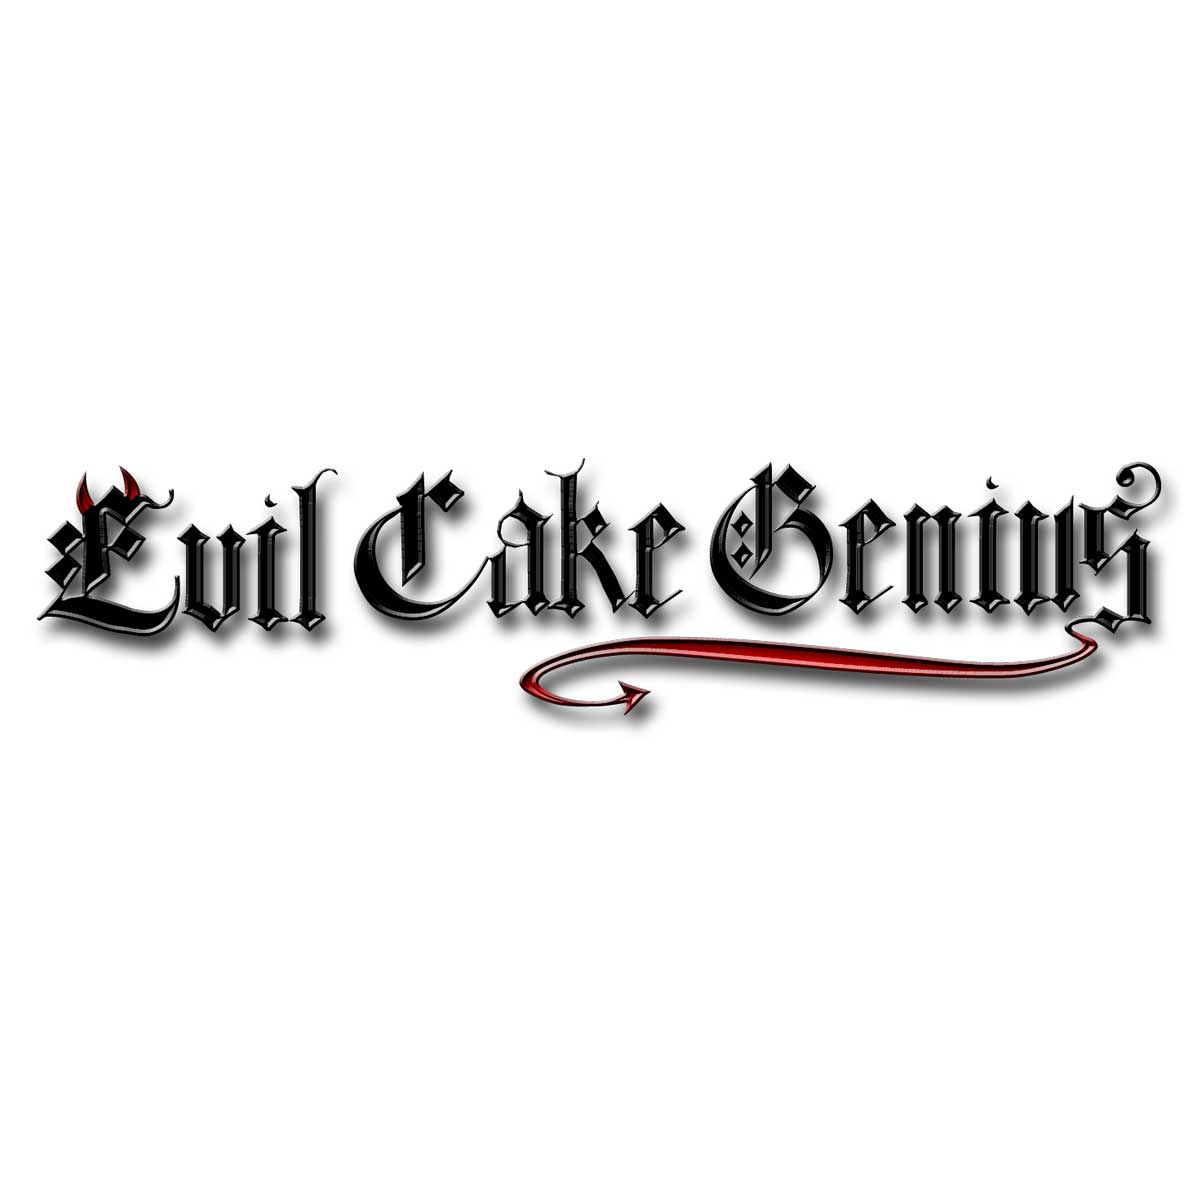 princess castle cake and cupcake stencil set